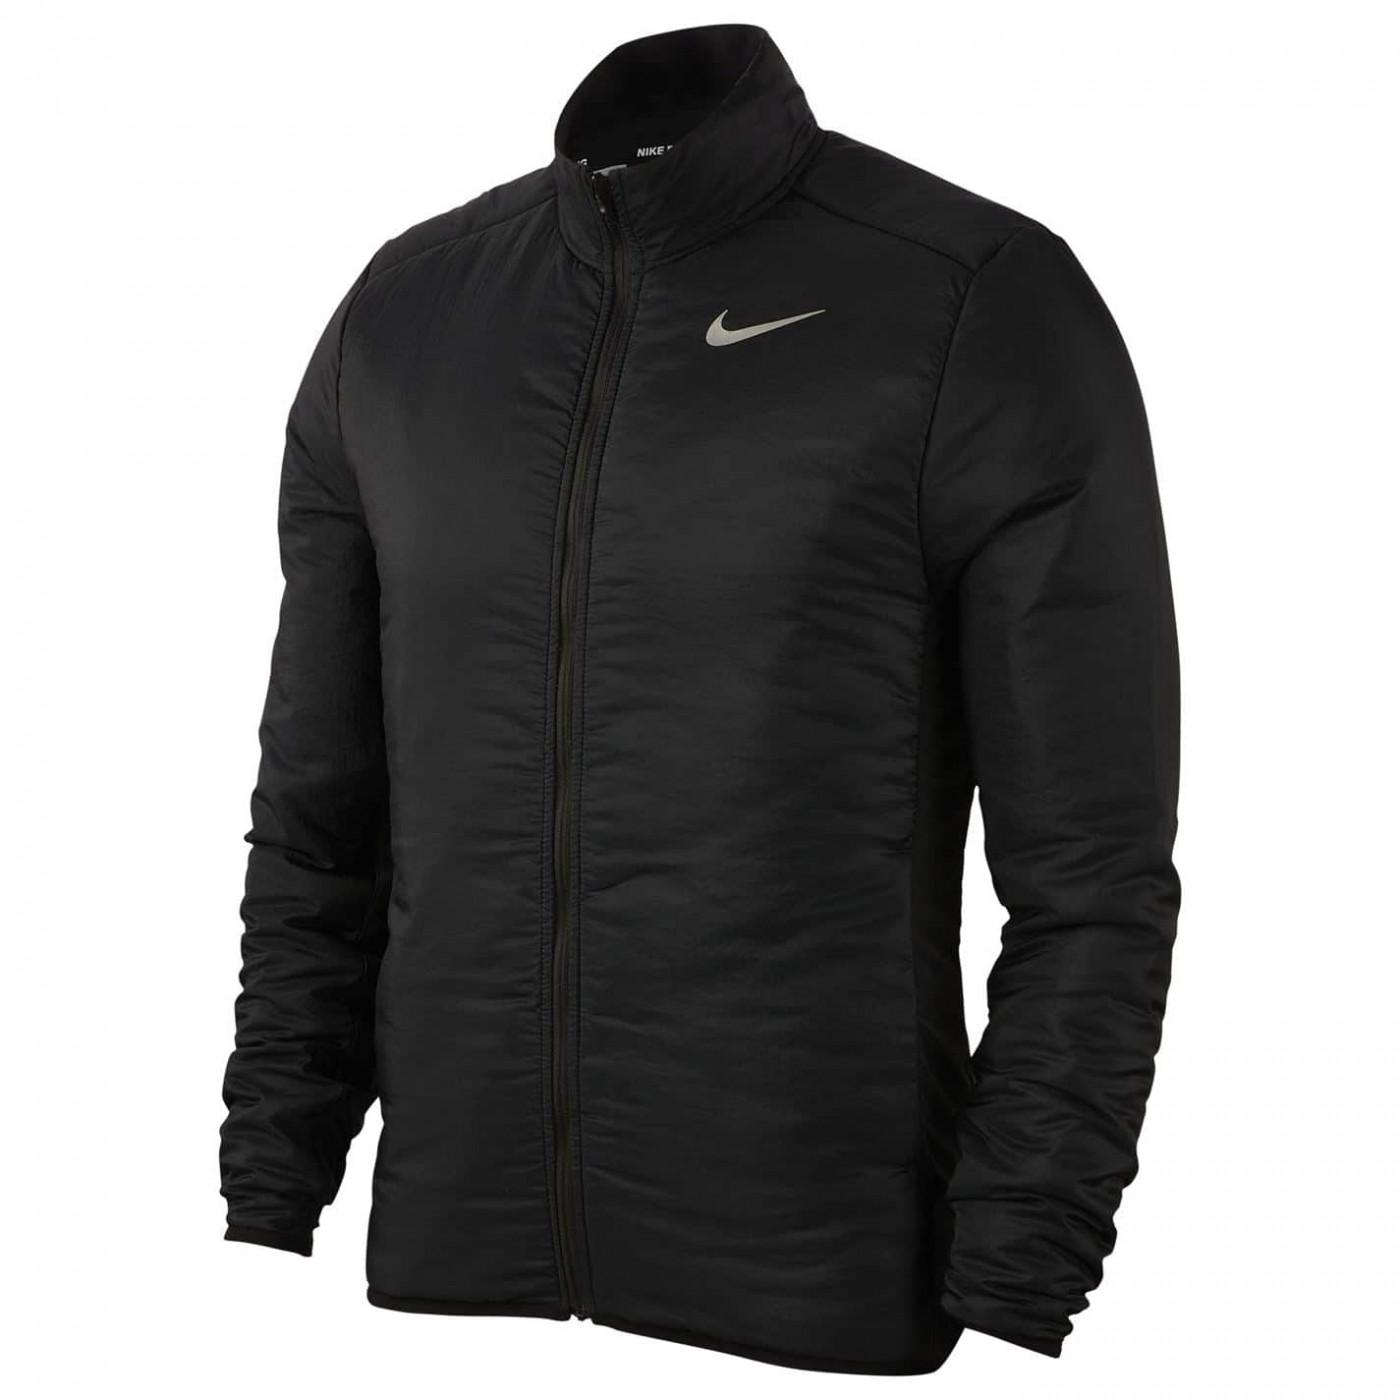 Nike Aero Layer Jacket Mens